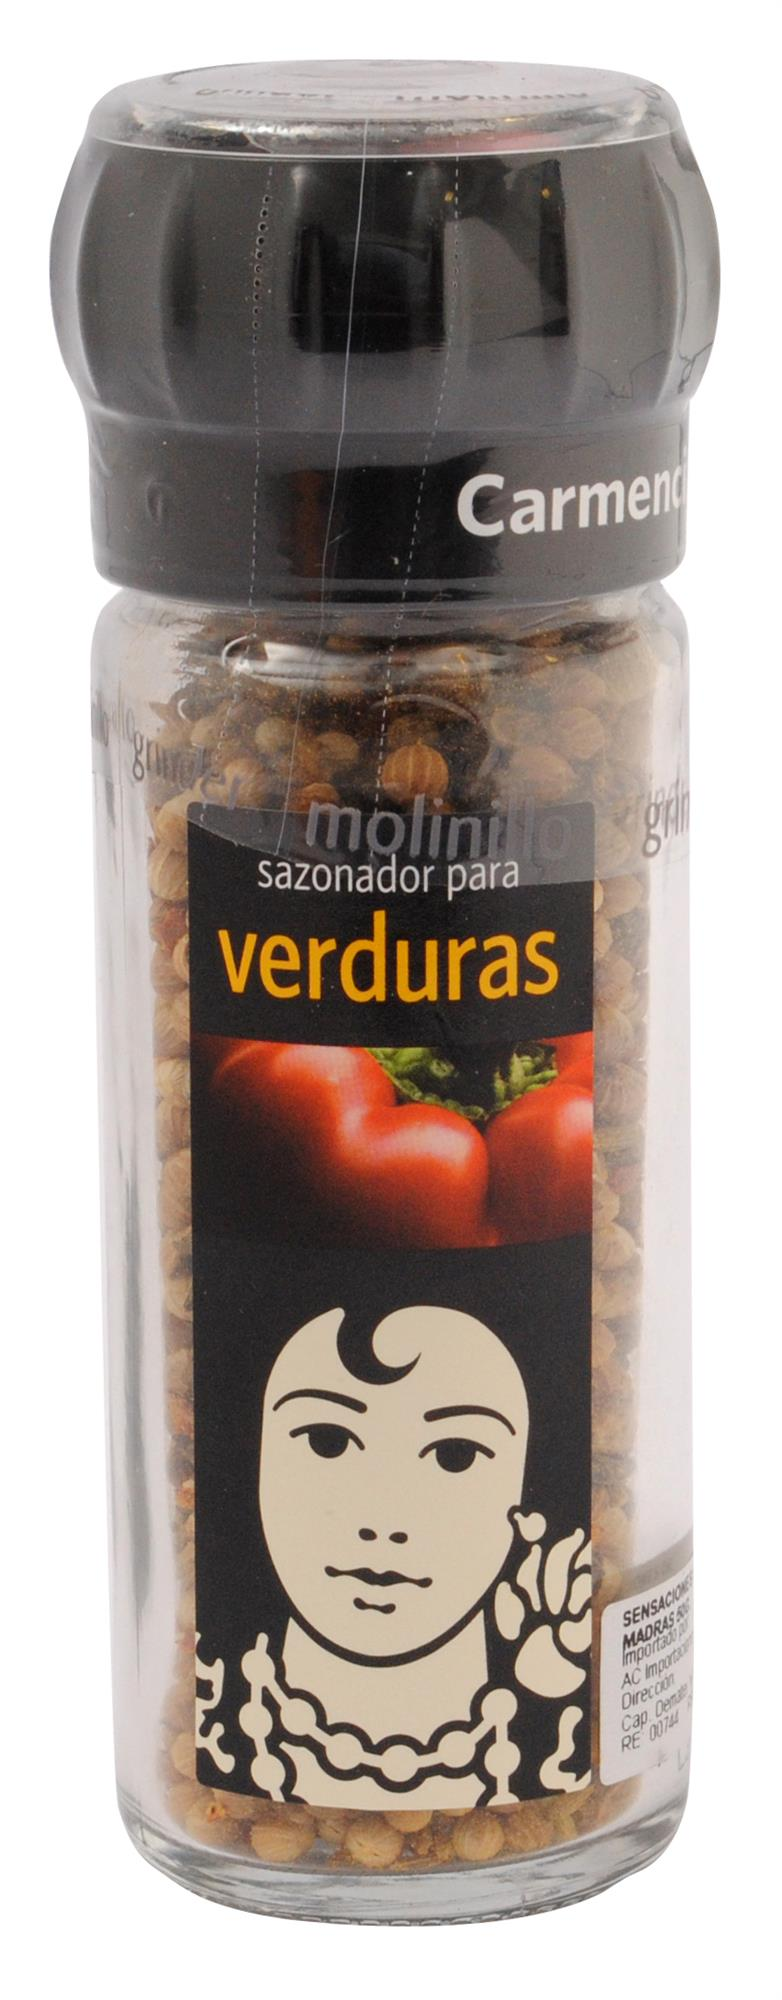 SAZONADOR PARA VERDURAS CARMENCITA FRASCO 48 GR